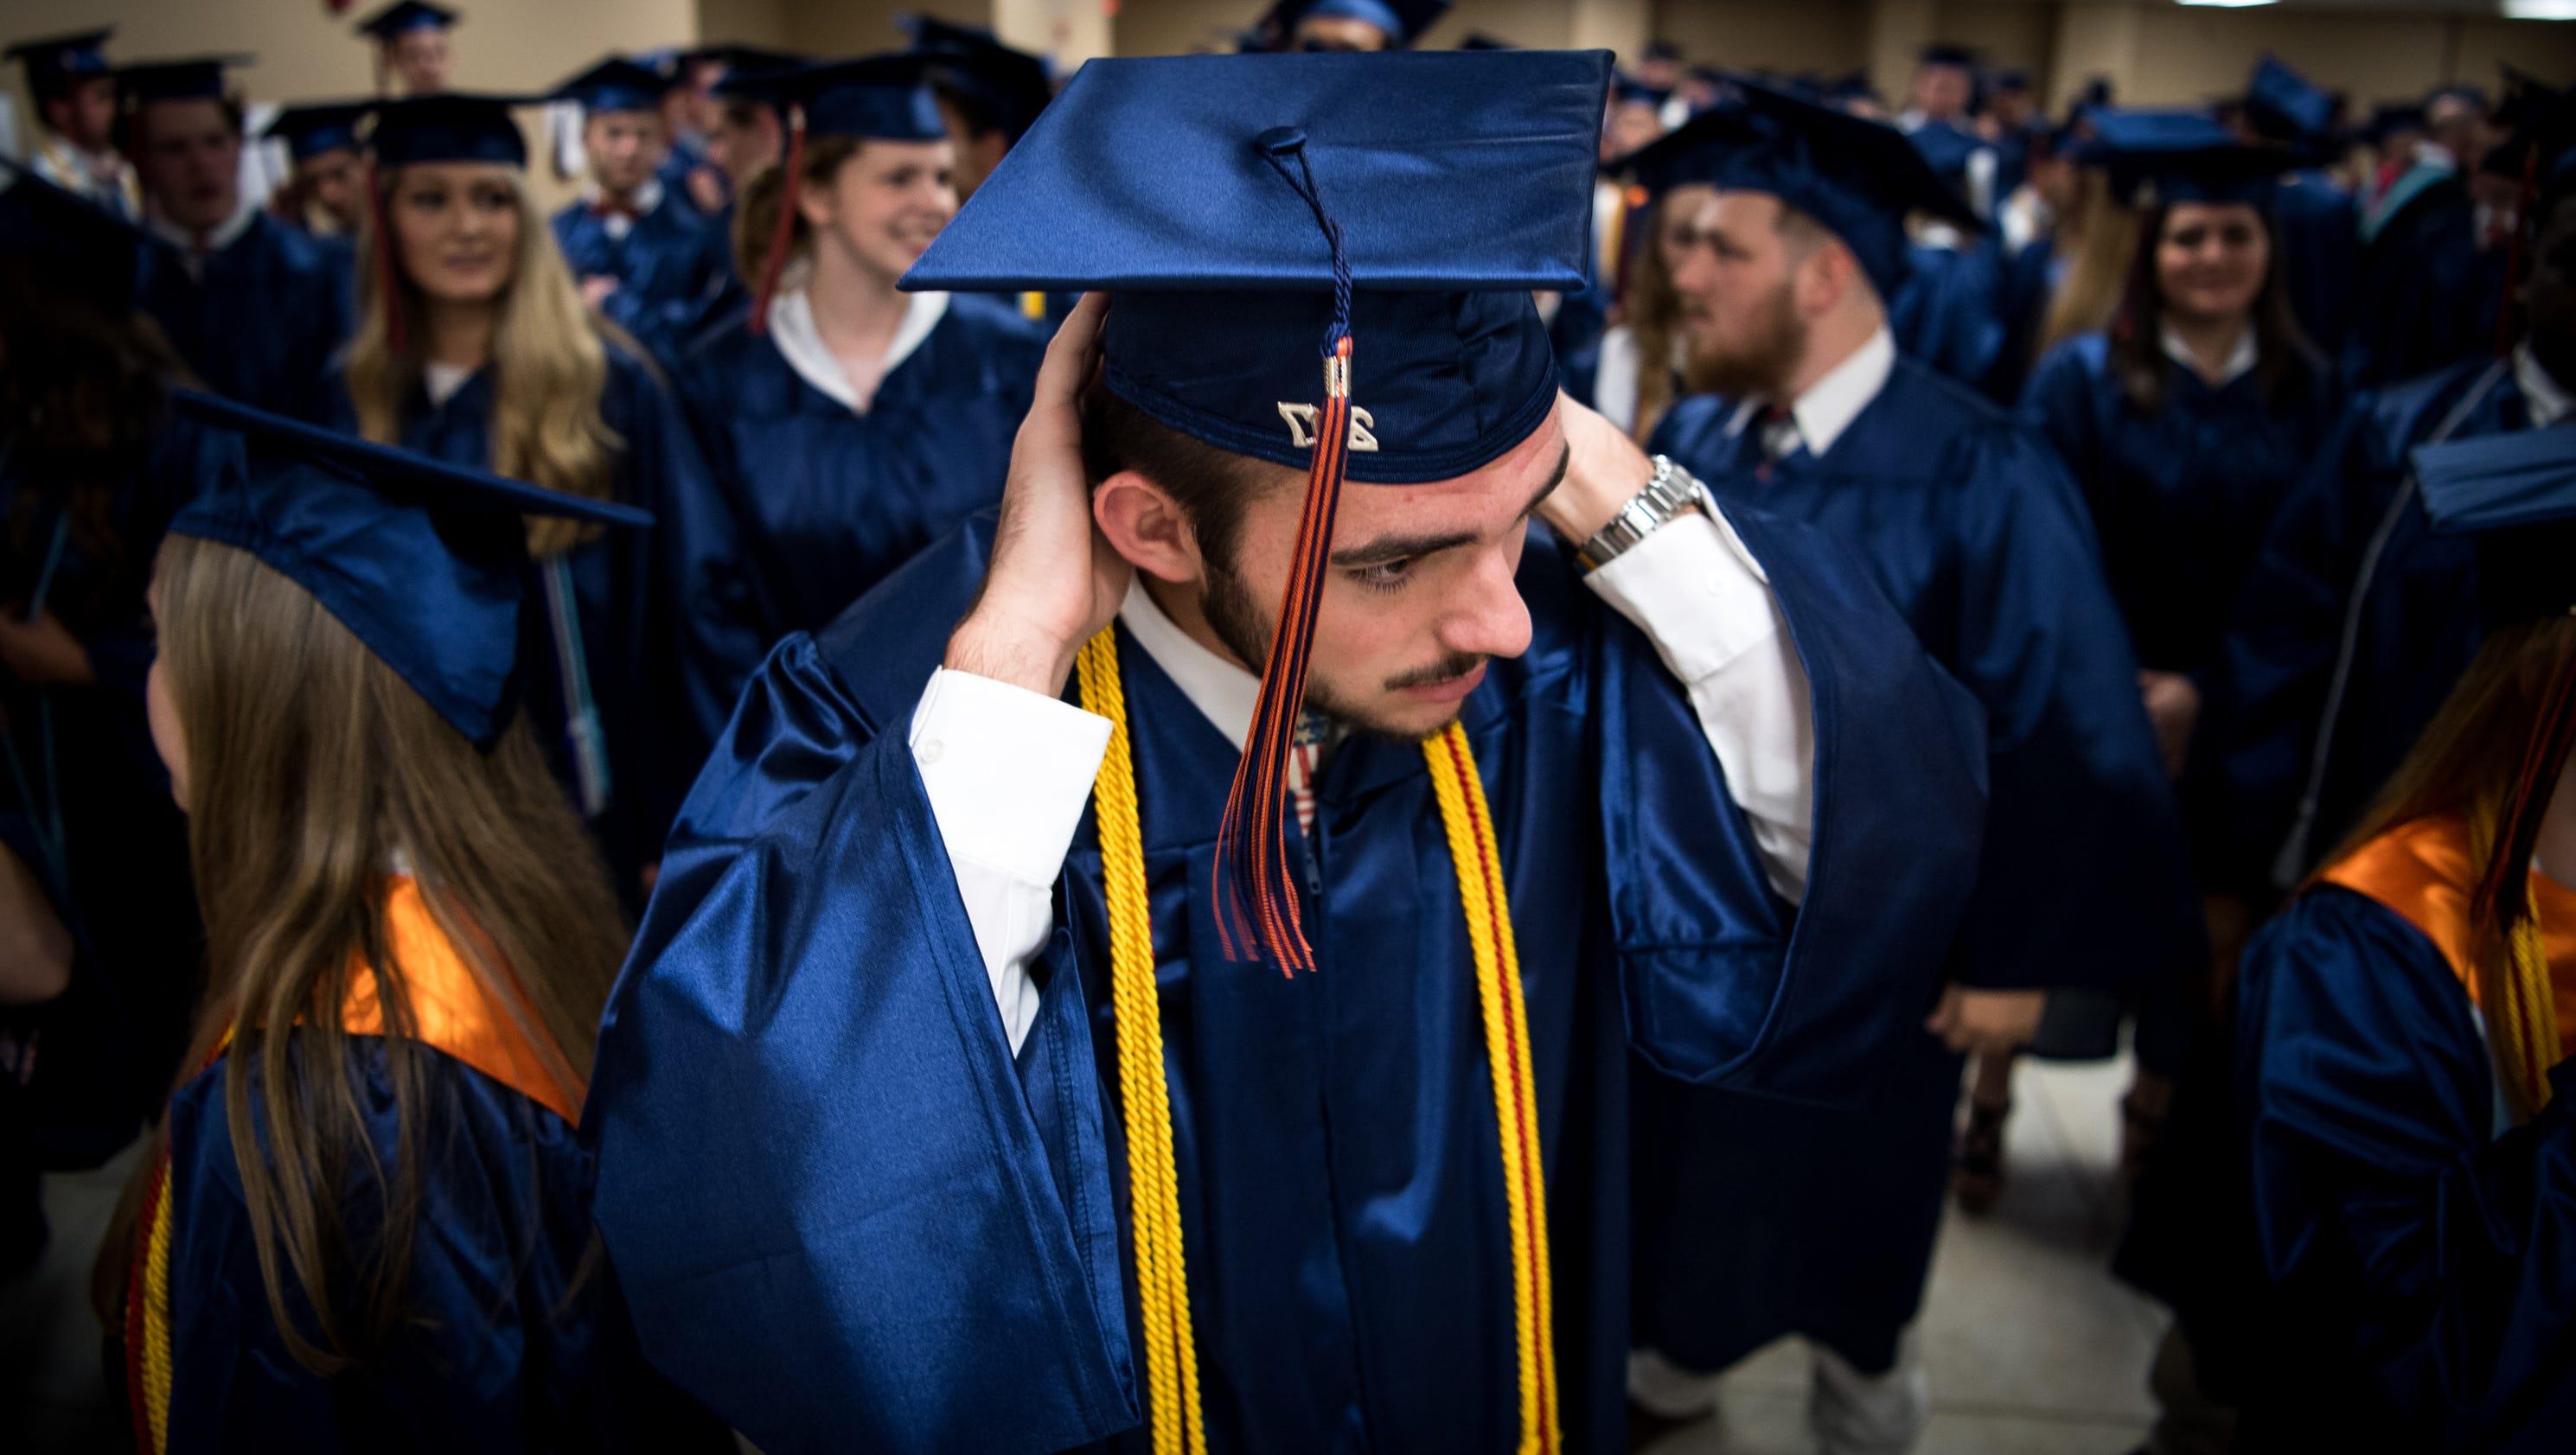 Graduating high school essays